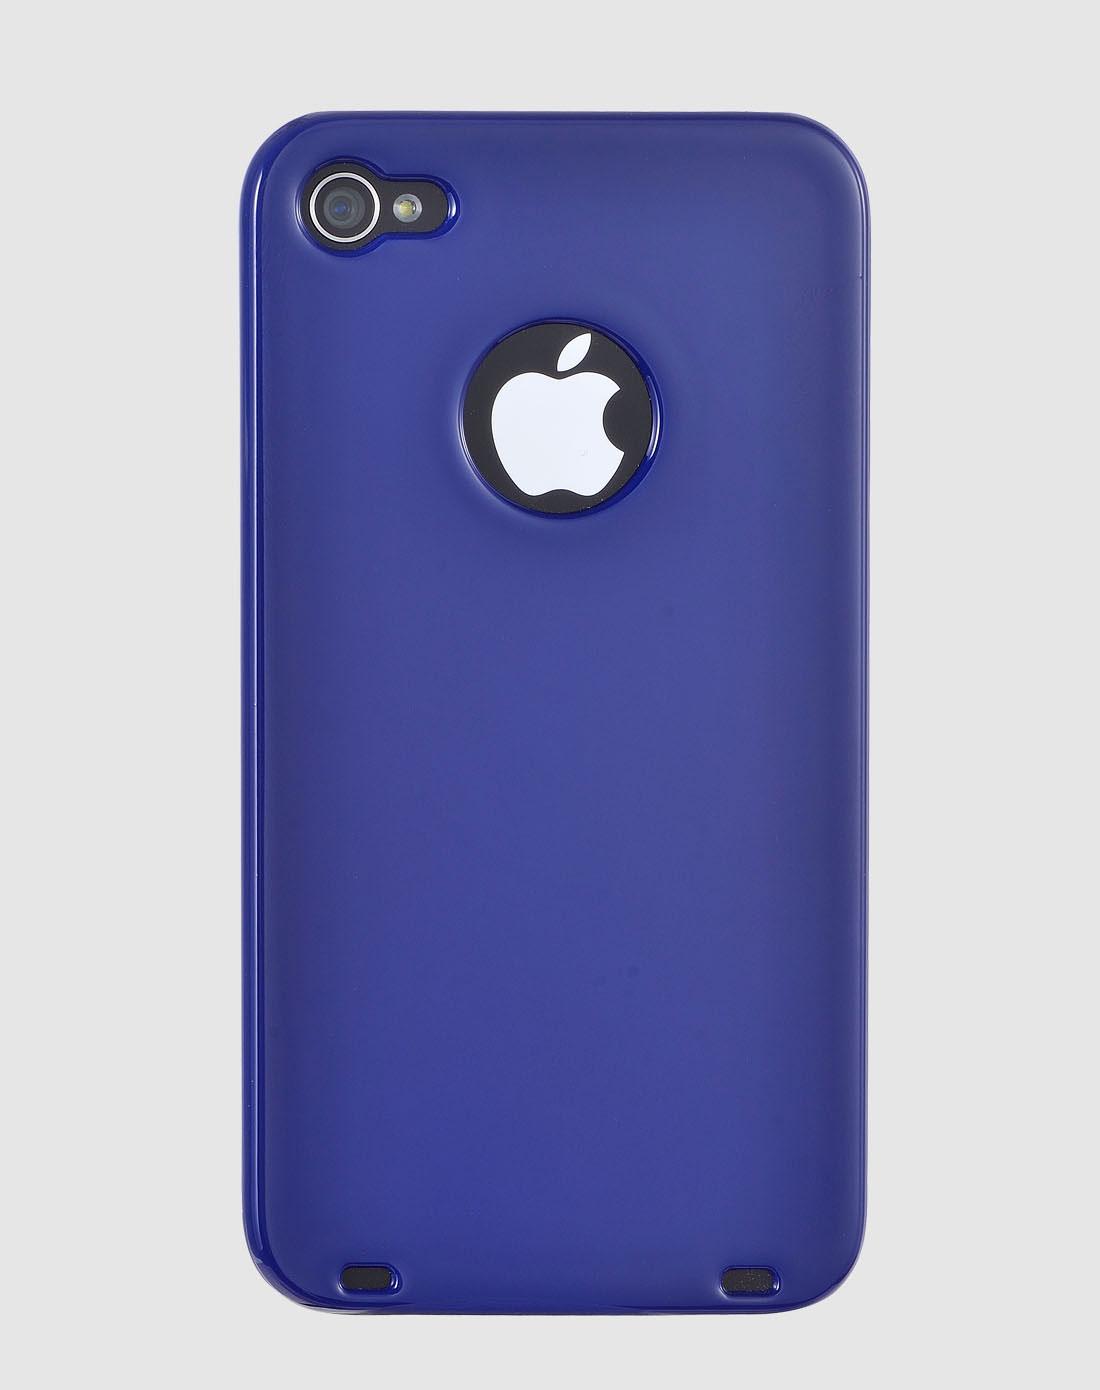 iphone4/4s 深蓝色12星座之巨蟹座手机壳图片